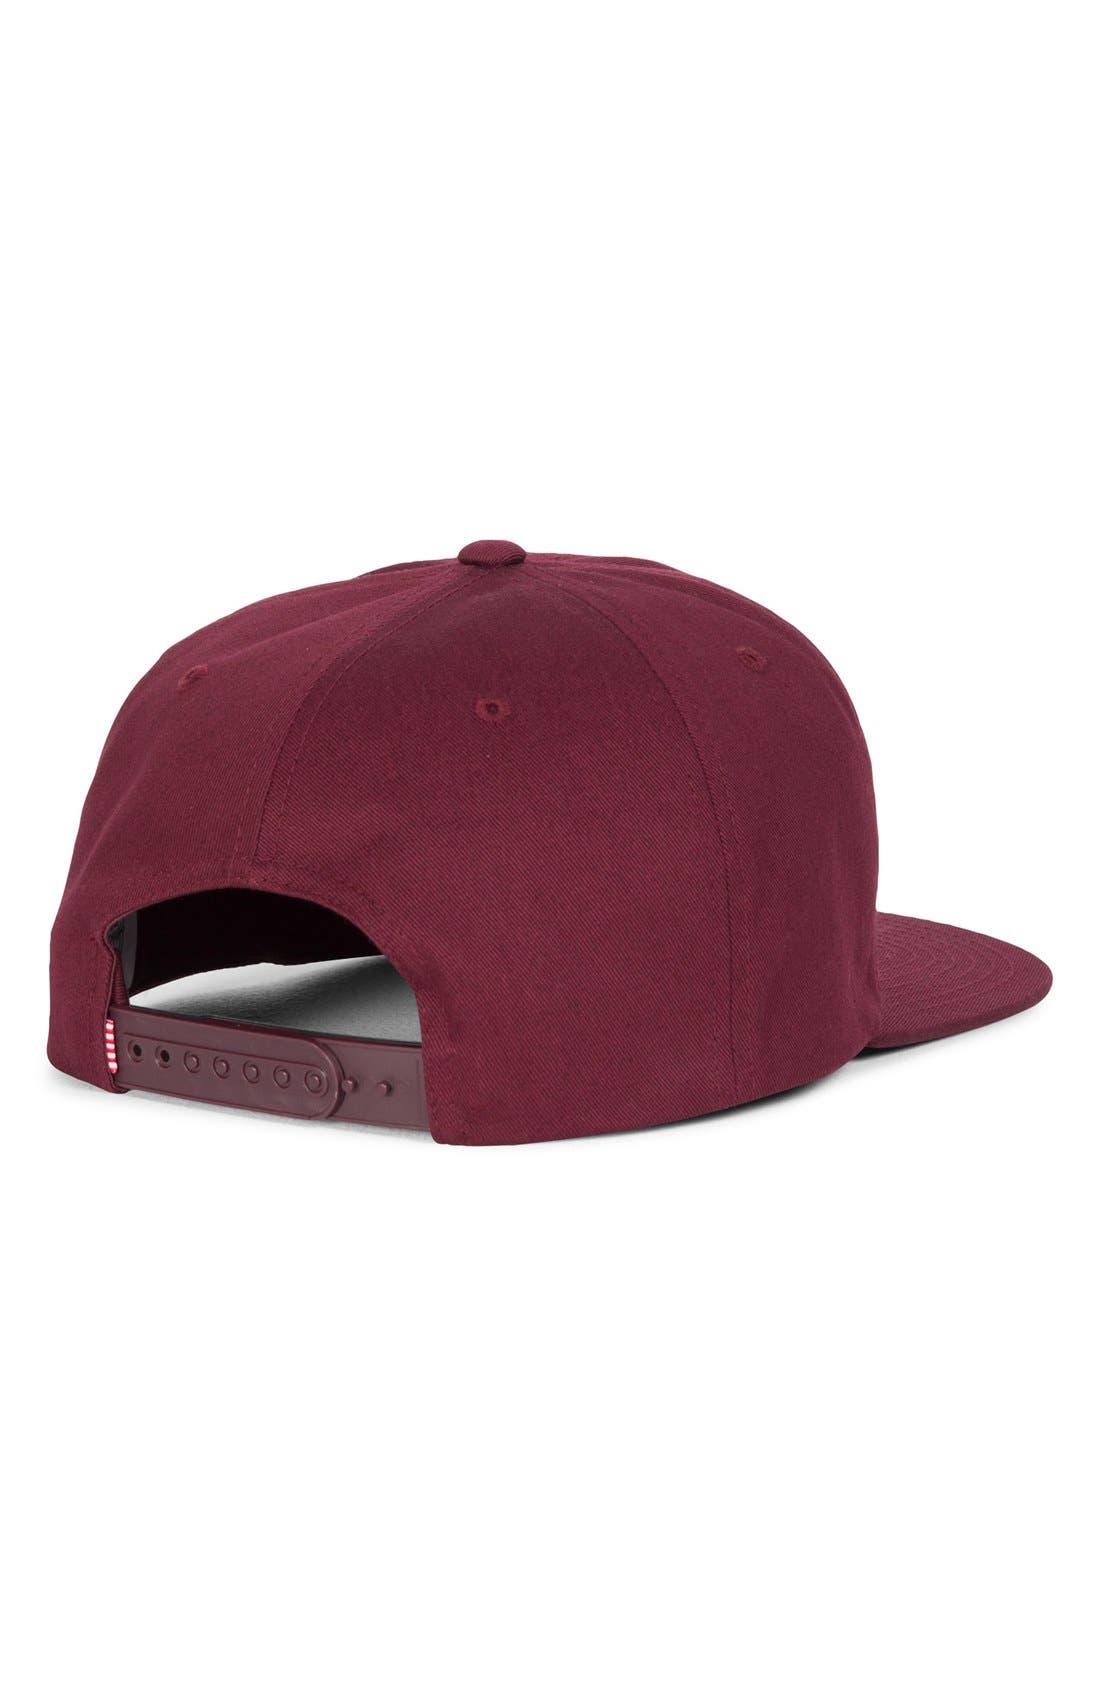 'Mosby' Snapback Baseball Cap,                             Alternate thumbnail 6, color,